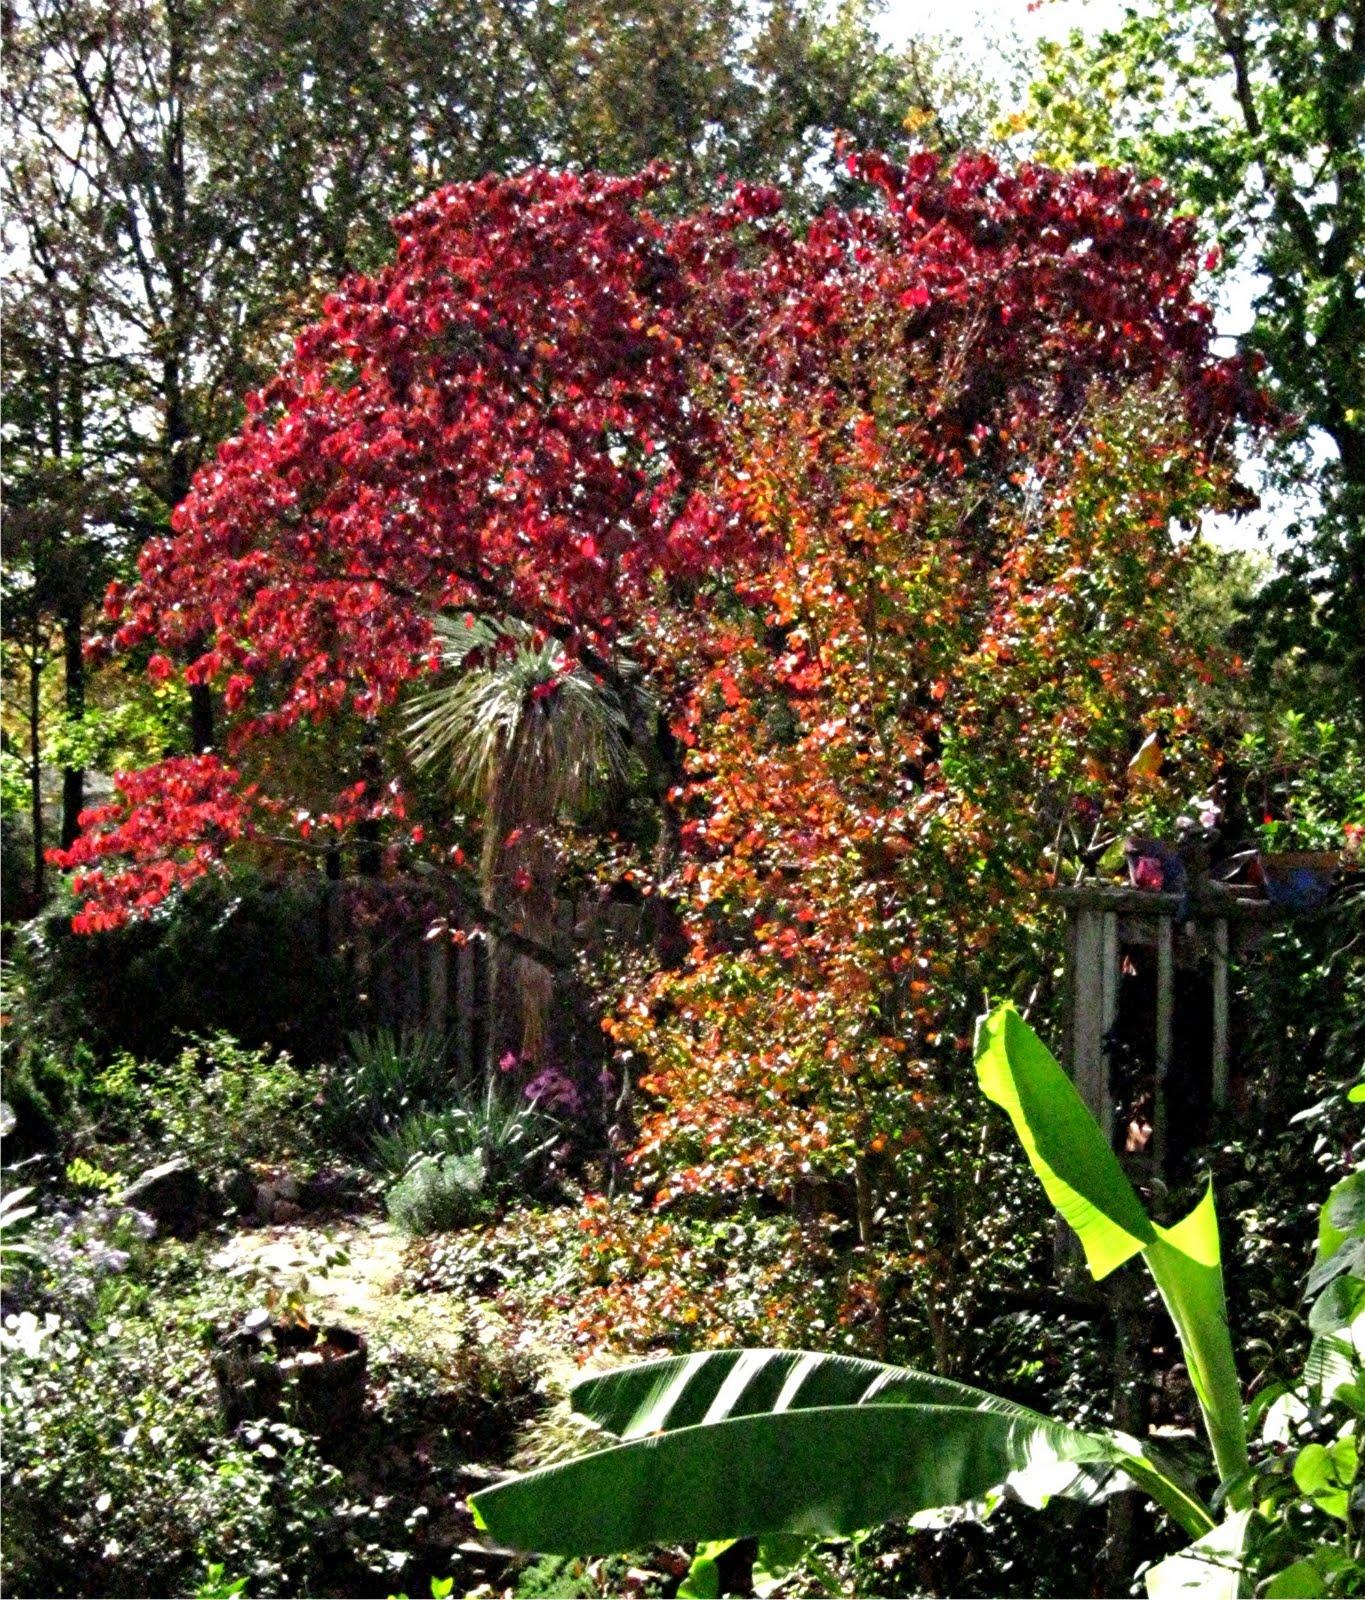 1003 Gardens: Cornus florida, Flowering dogwood, fall color......wow